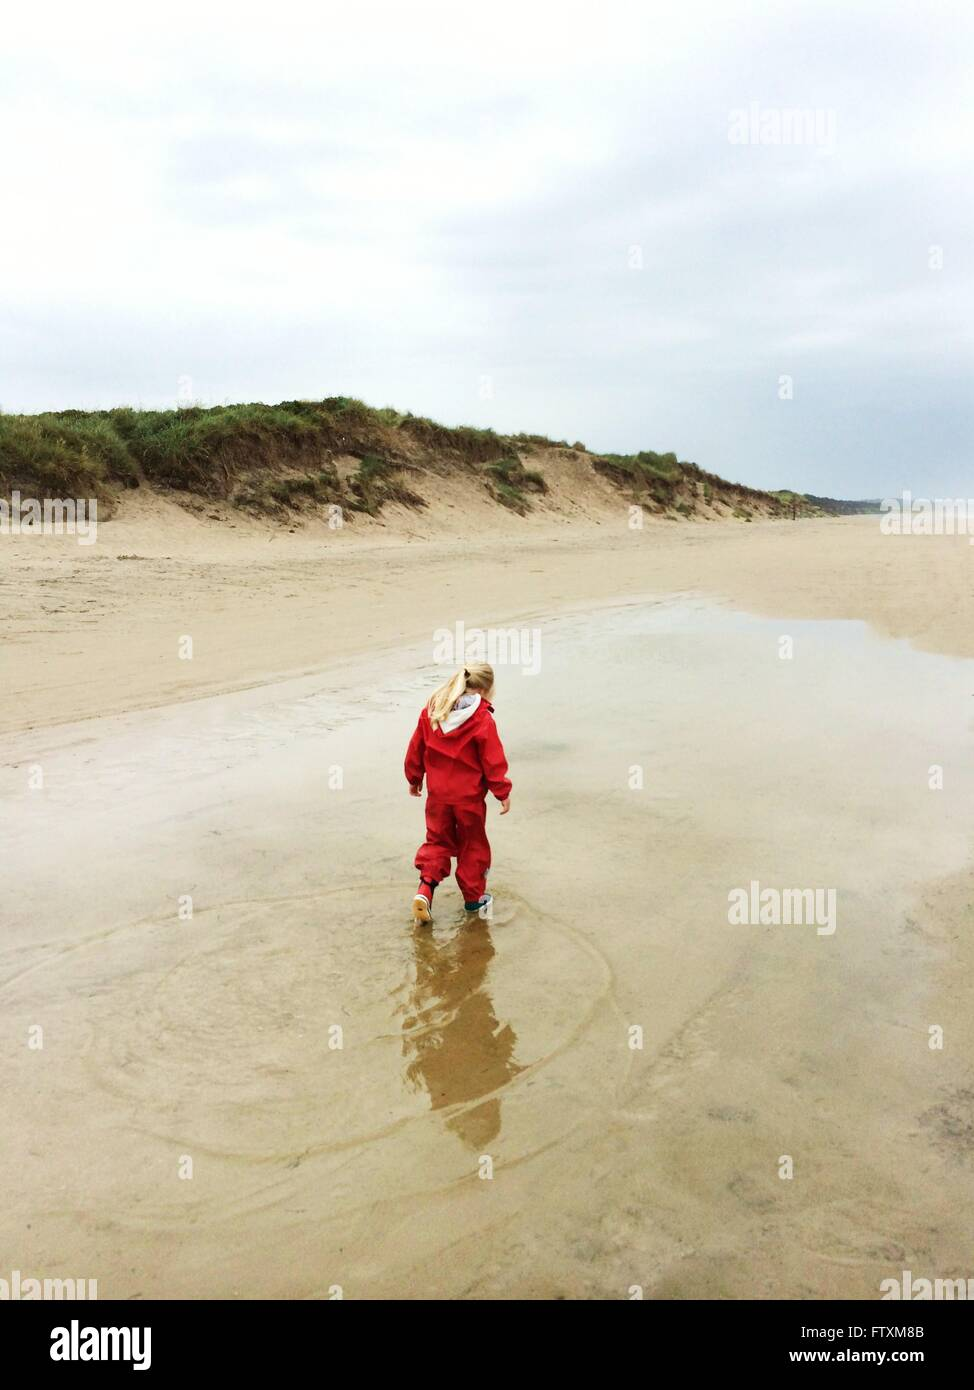 Girl walking on beach on overcast day - Stock Image